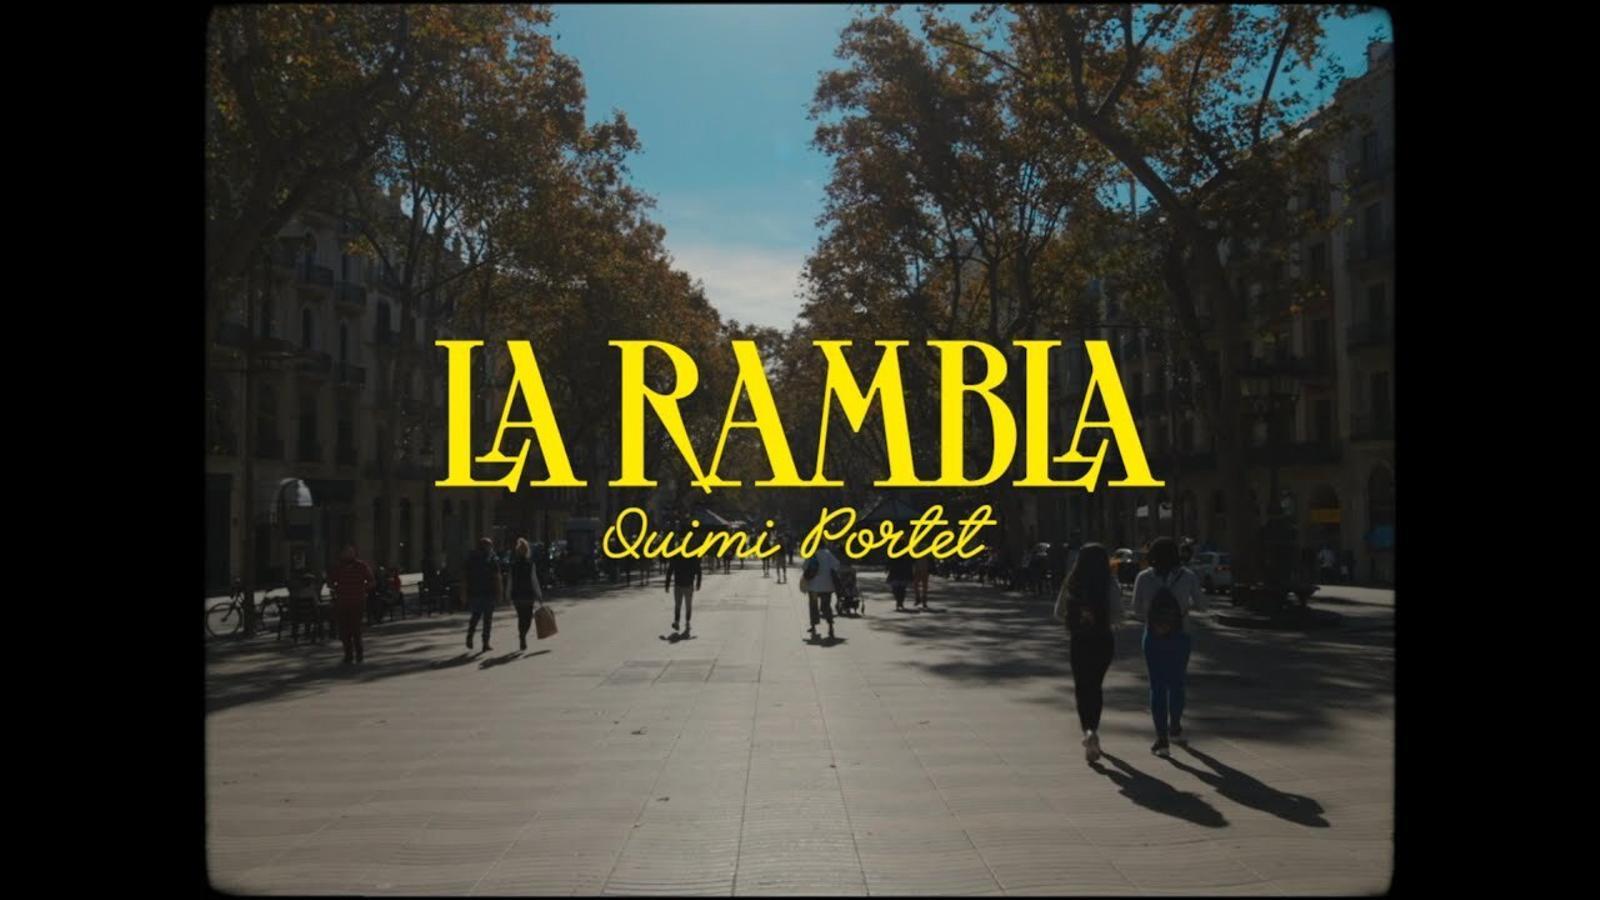 'La Rambla', de Quimi Portet, videoclip 2020